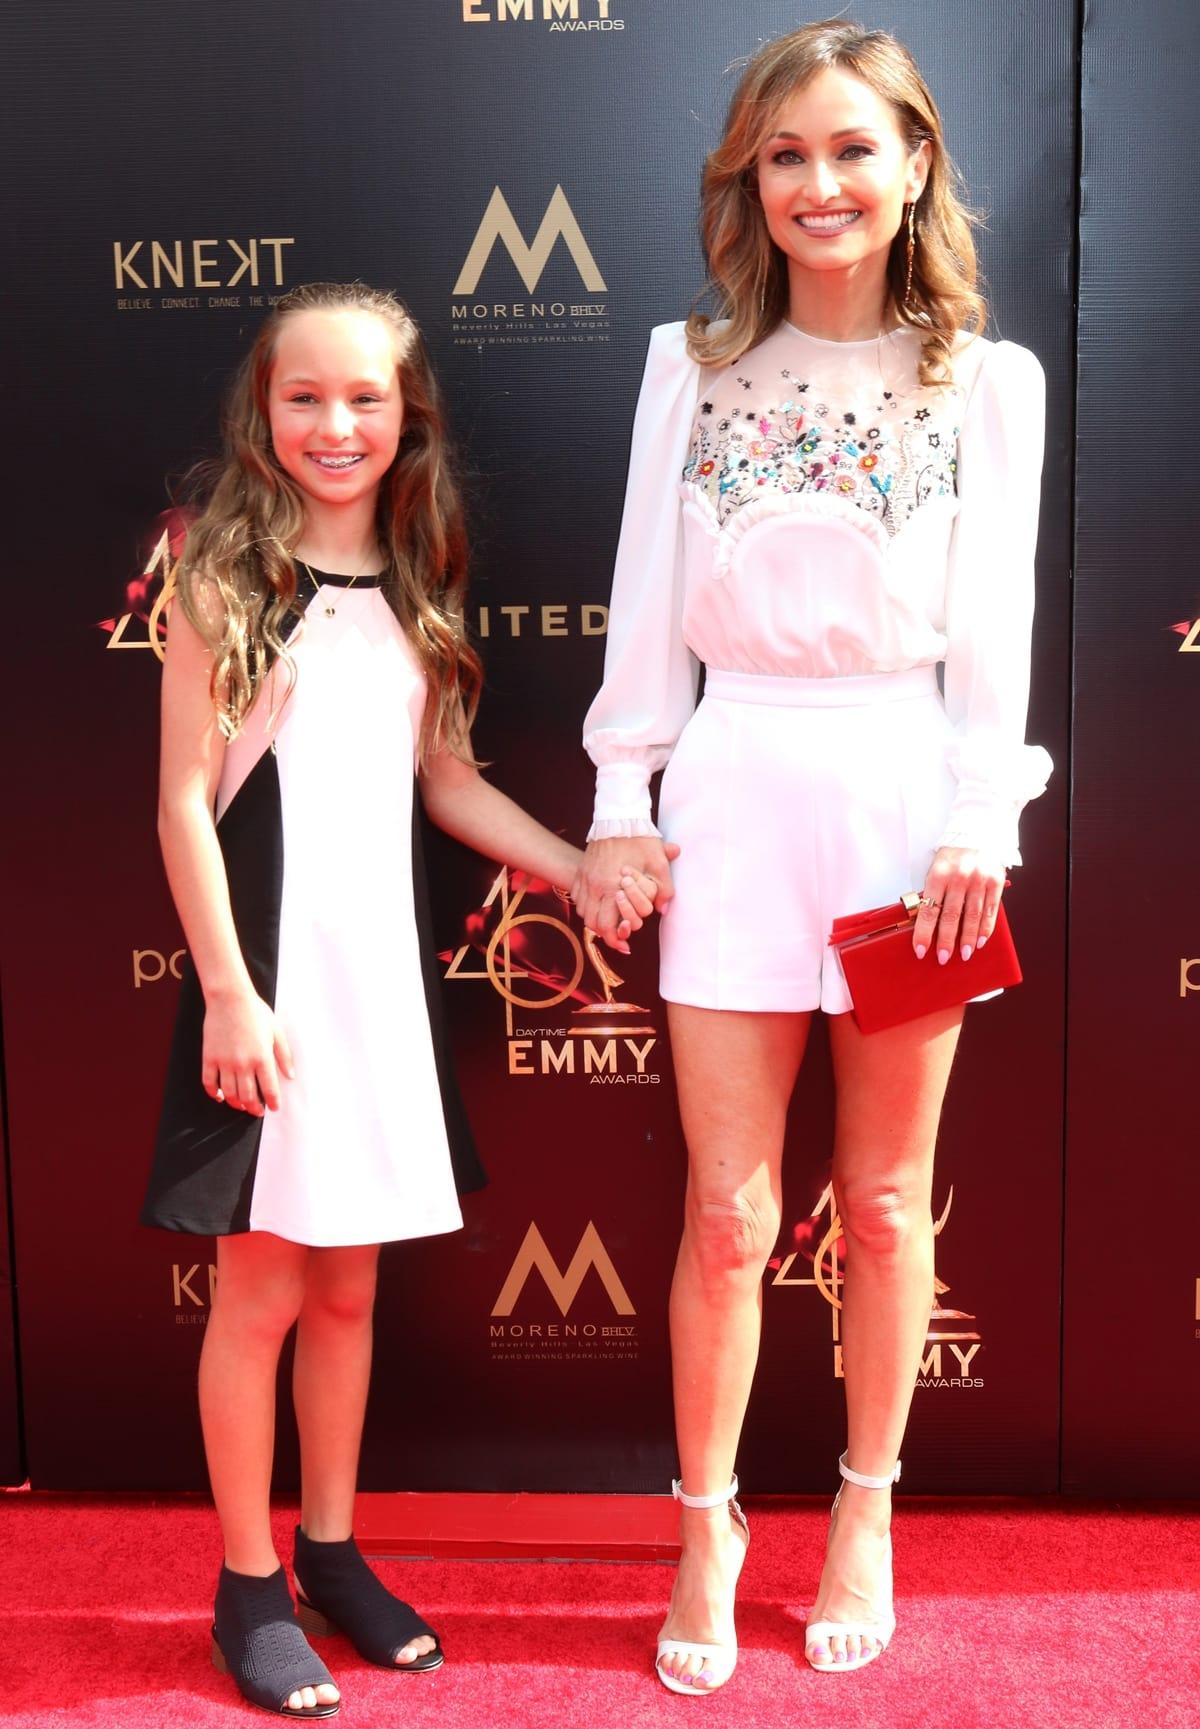 Jade Marie De Laurentiis Thompson and her mother Giada De Laurentiis at the 2019 Daytime Emmy Awards